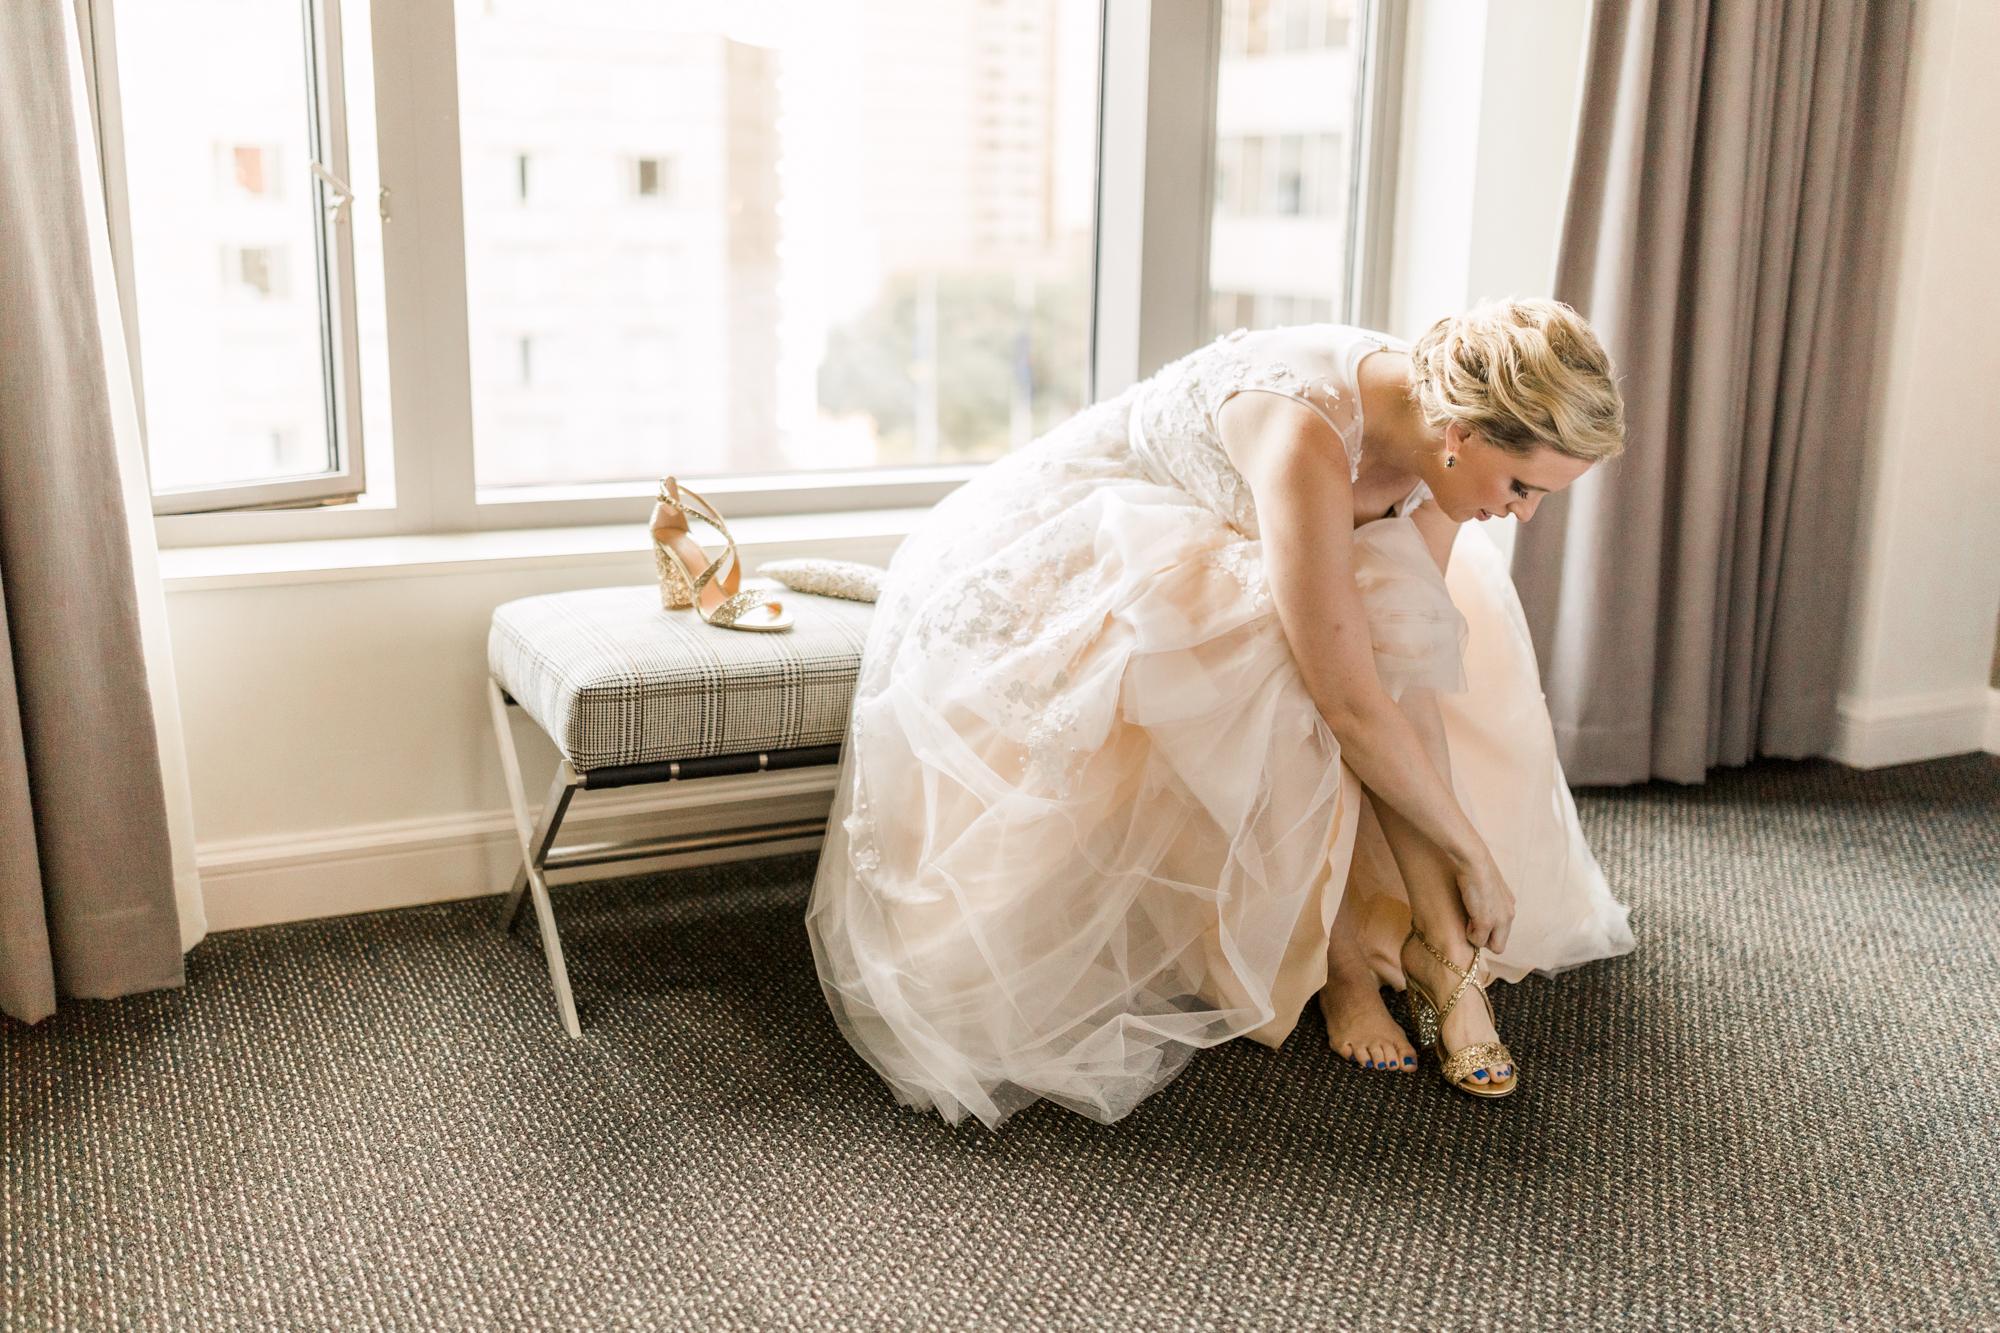 haley-richter-photography-autumn-college-of-physicians-wedding-philadelphia--031.jpg